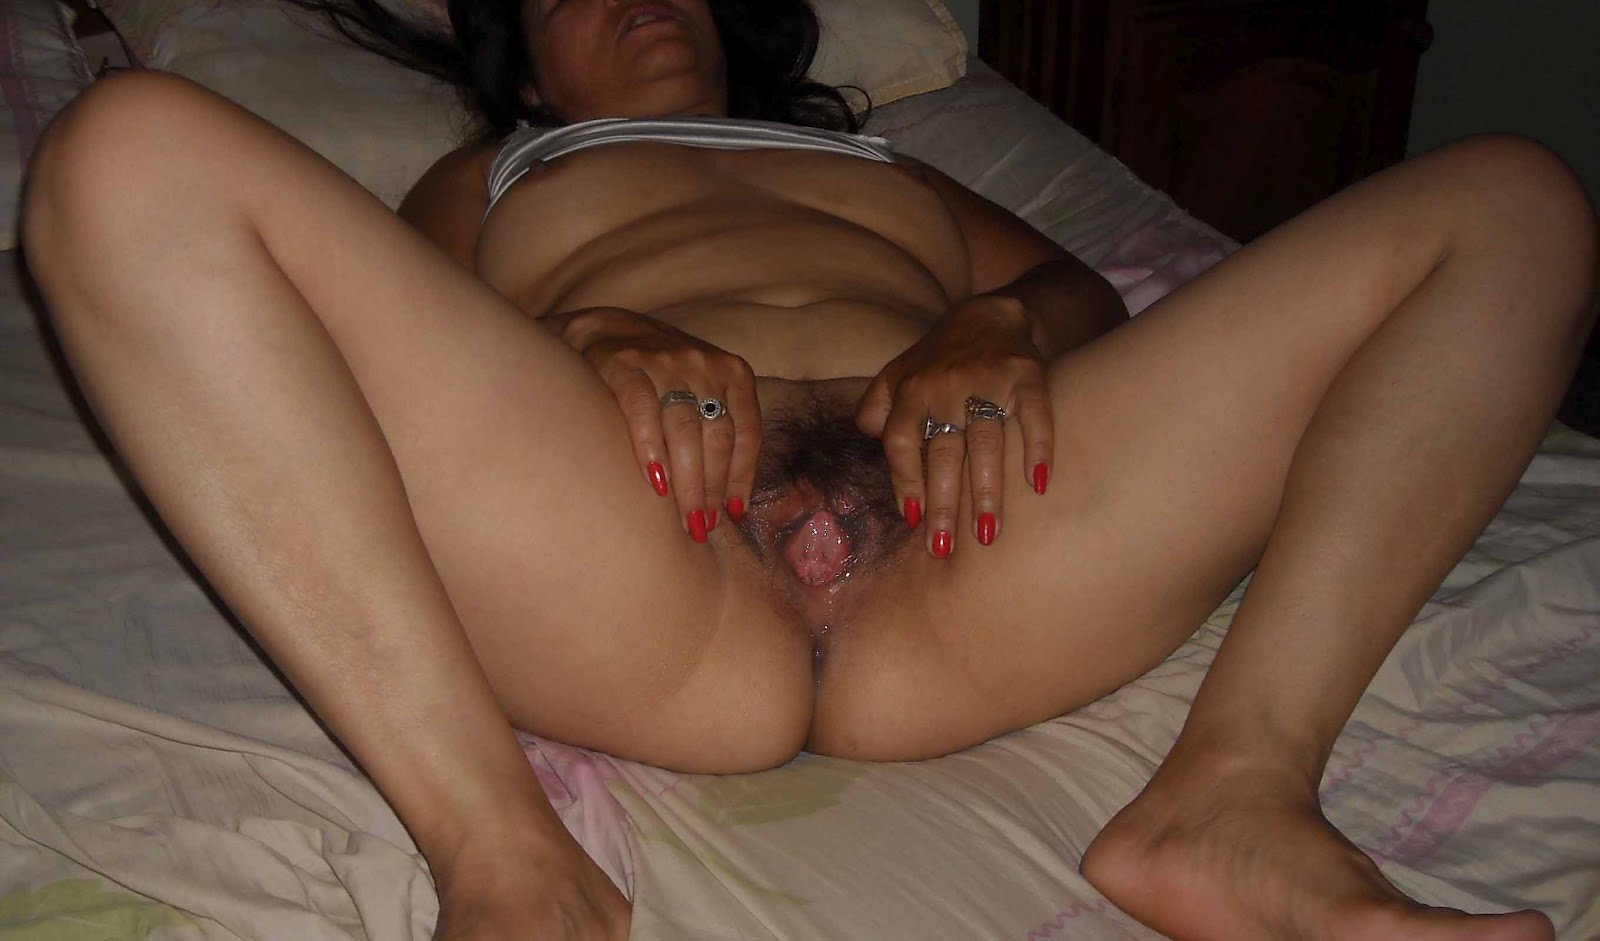 Intercambio fotos de mi esposa desnuda - Esposas